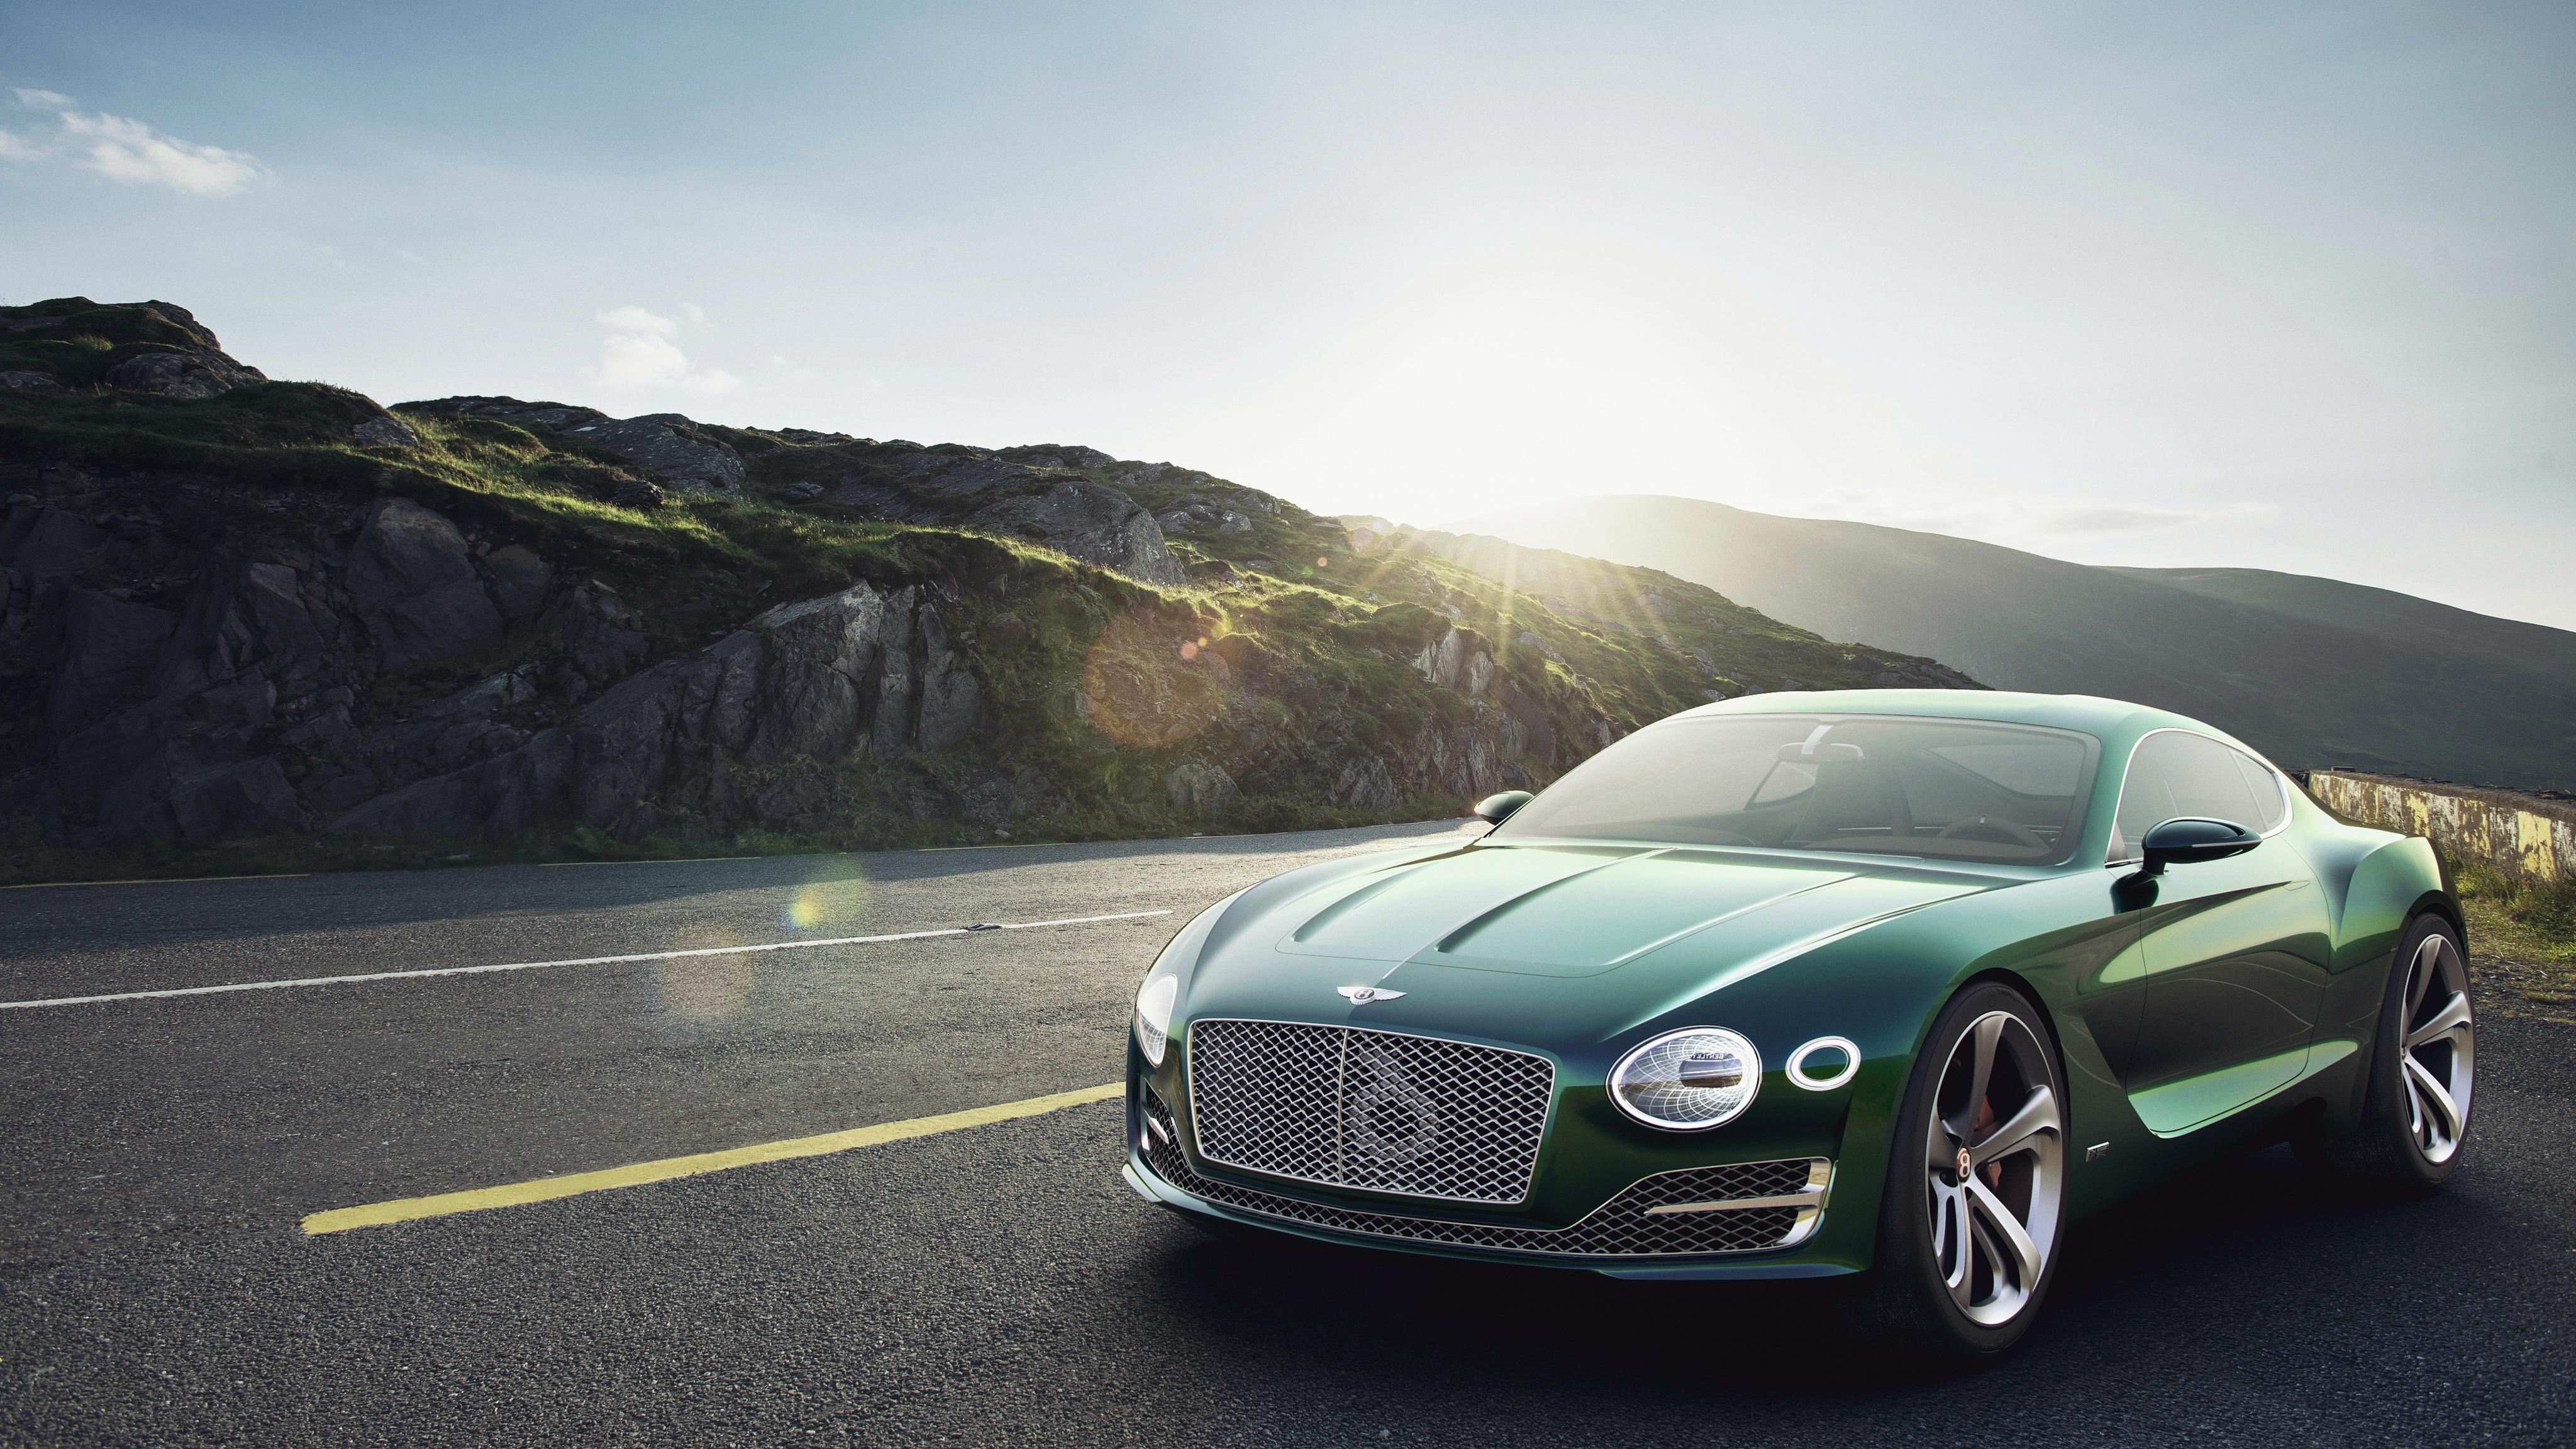 Wallpaper : green, sports car, 2015, Bentley, Maserati, performance ...